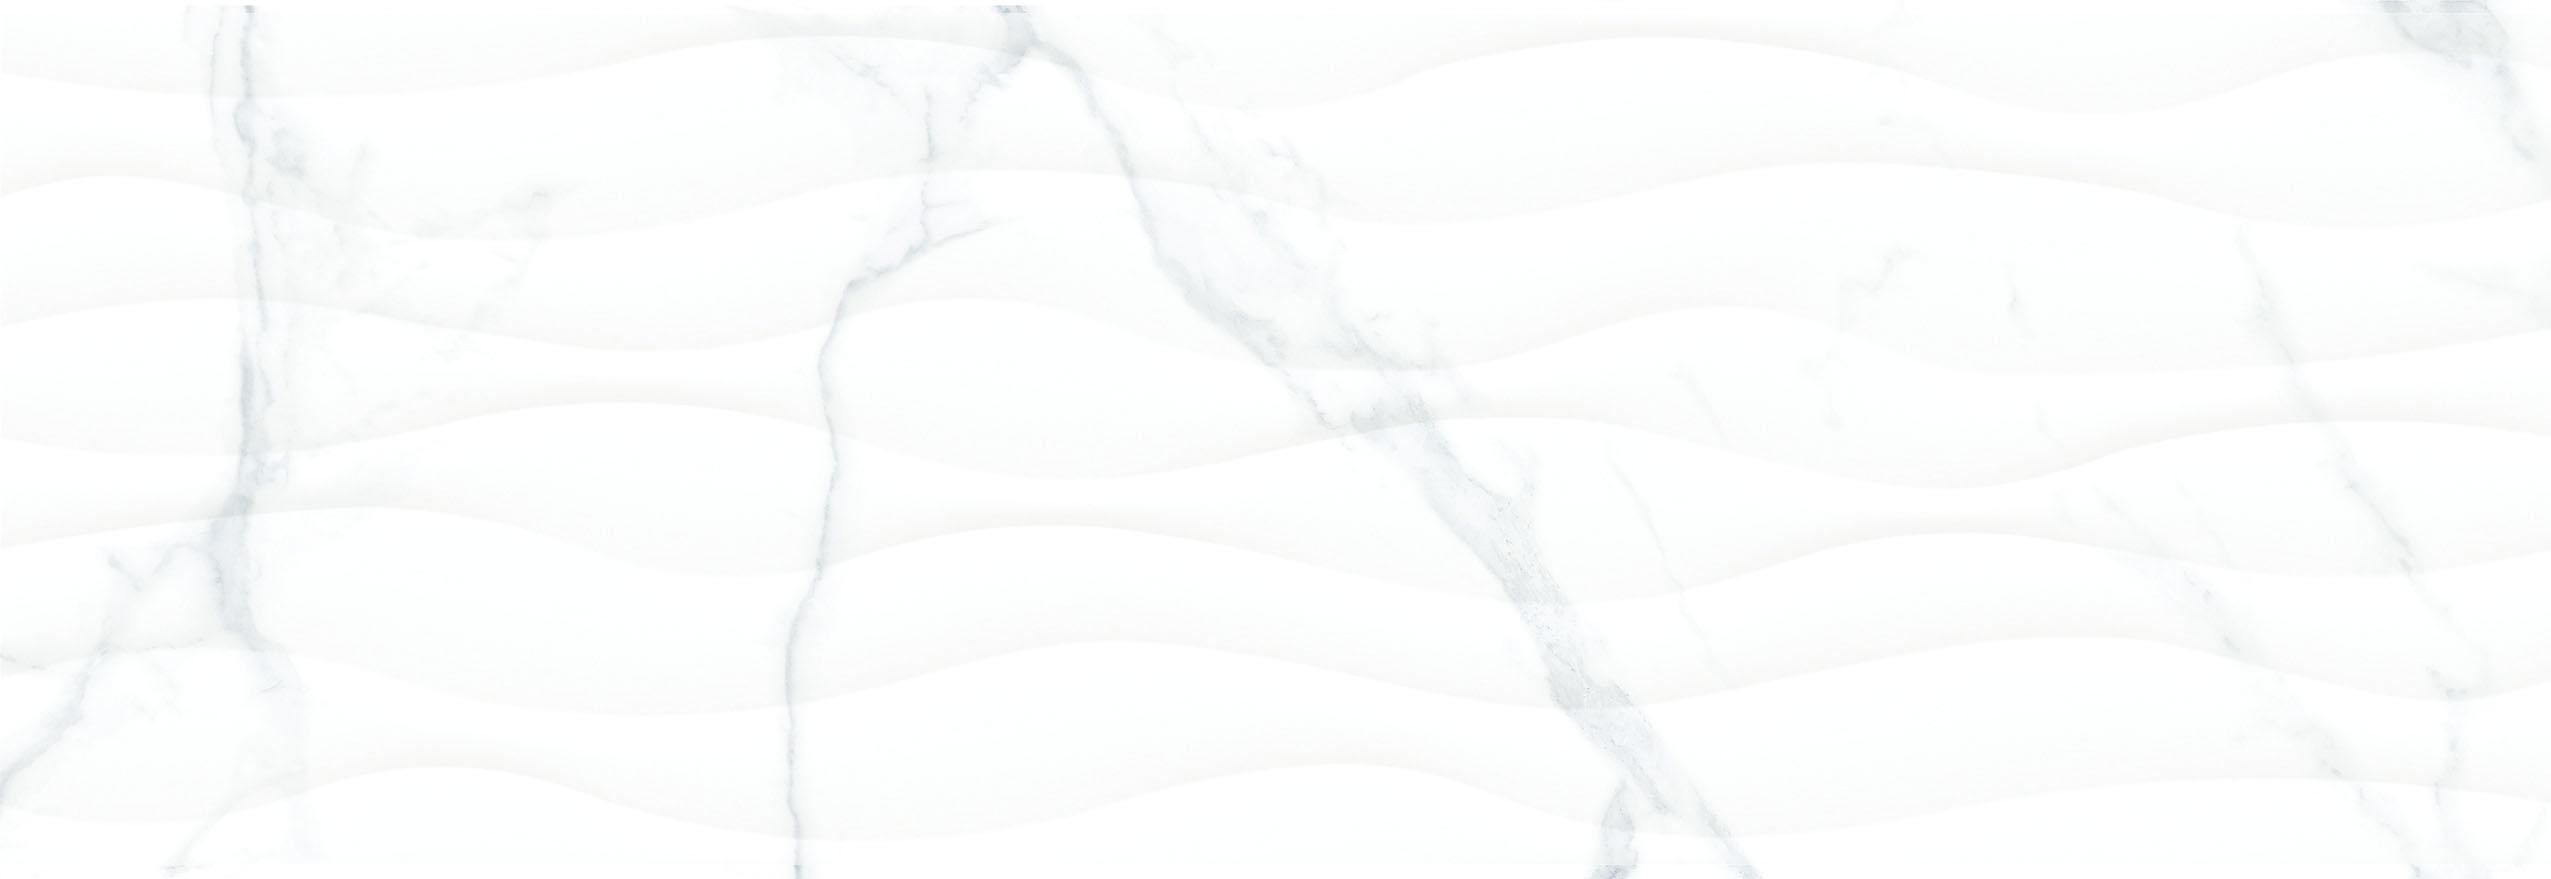 LONGFAVOR wave 300x600mm Ceramic Wall Tile bulk production Borders-2